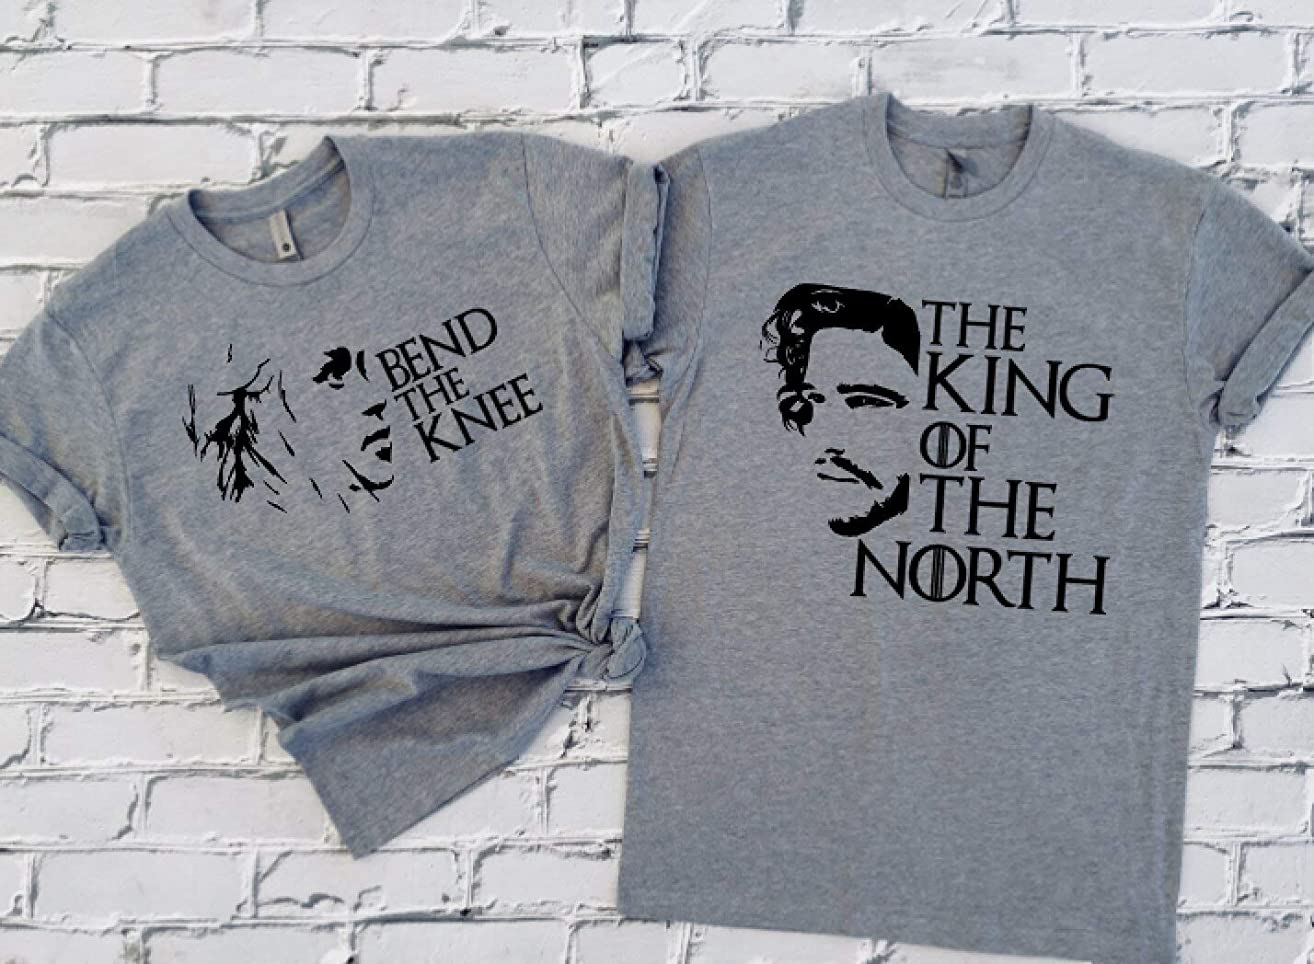 Game Of Thrones Inspired Matching Shirts, Jon Snow King Of The North Khaleesi Shirt